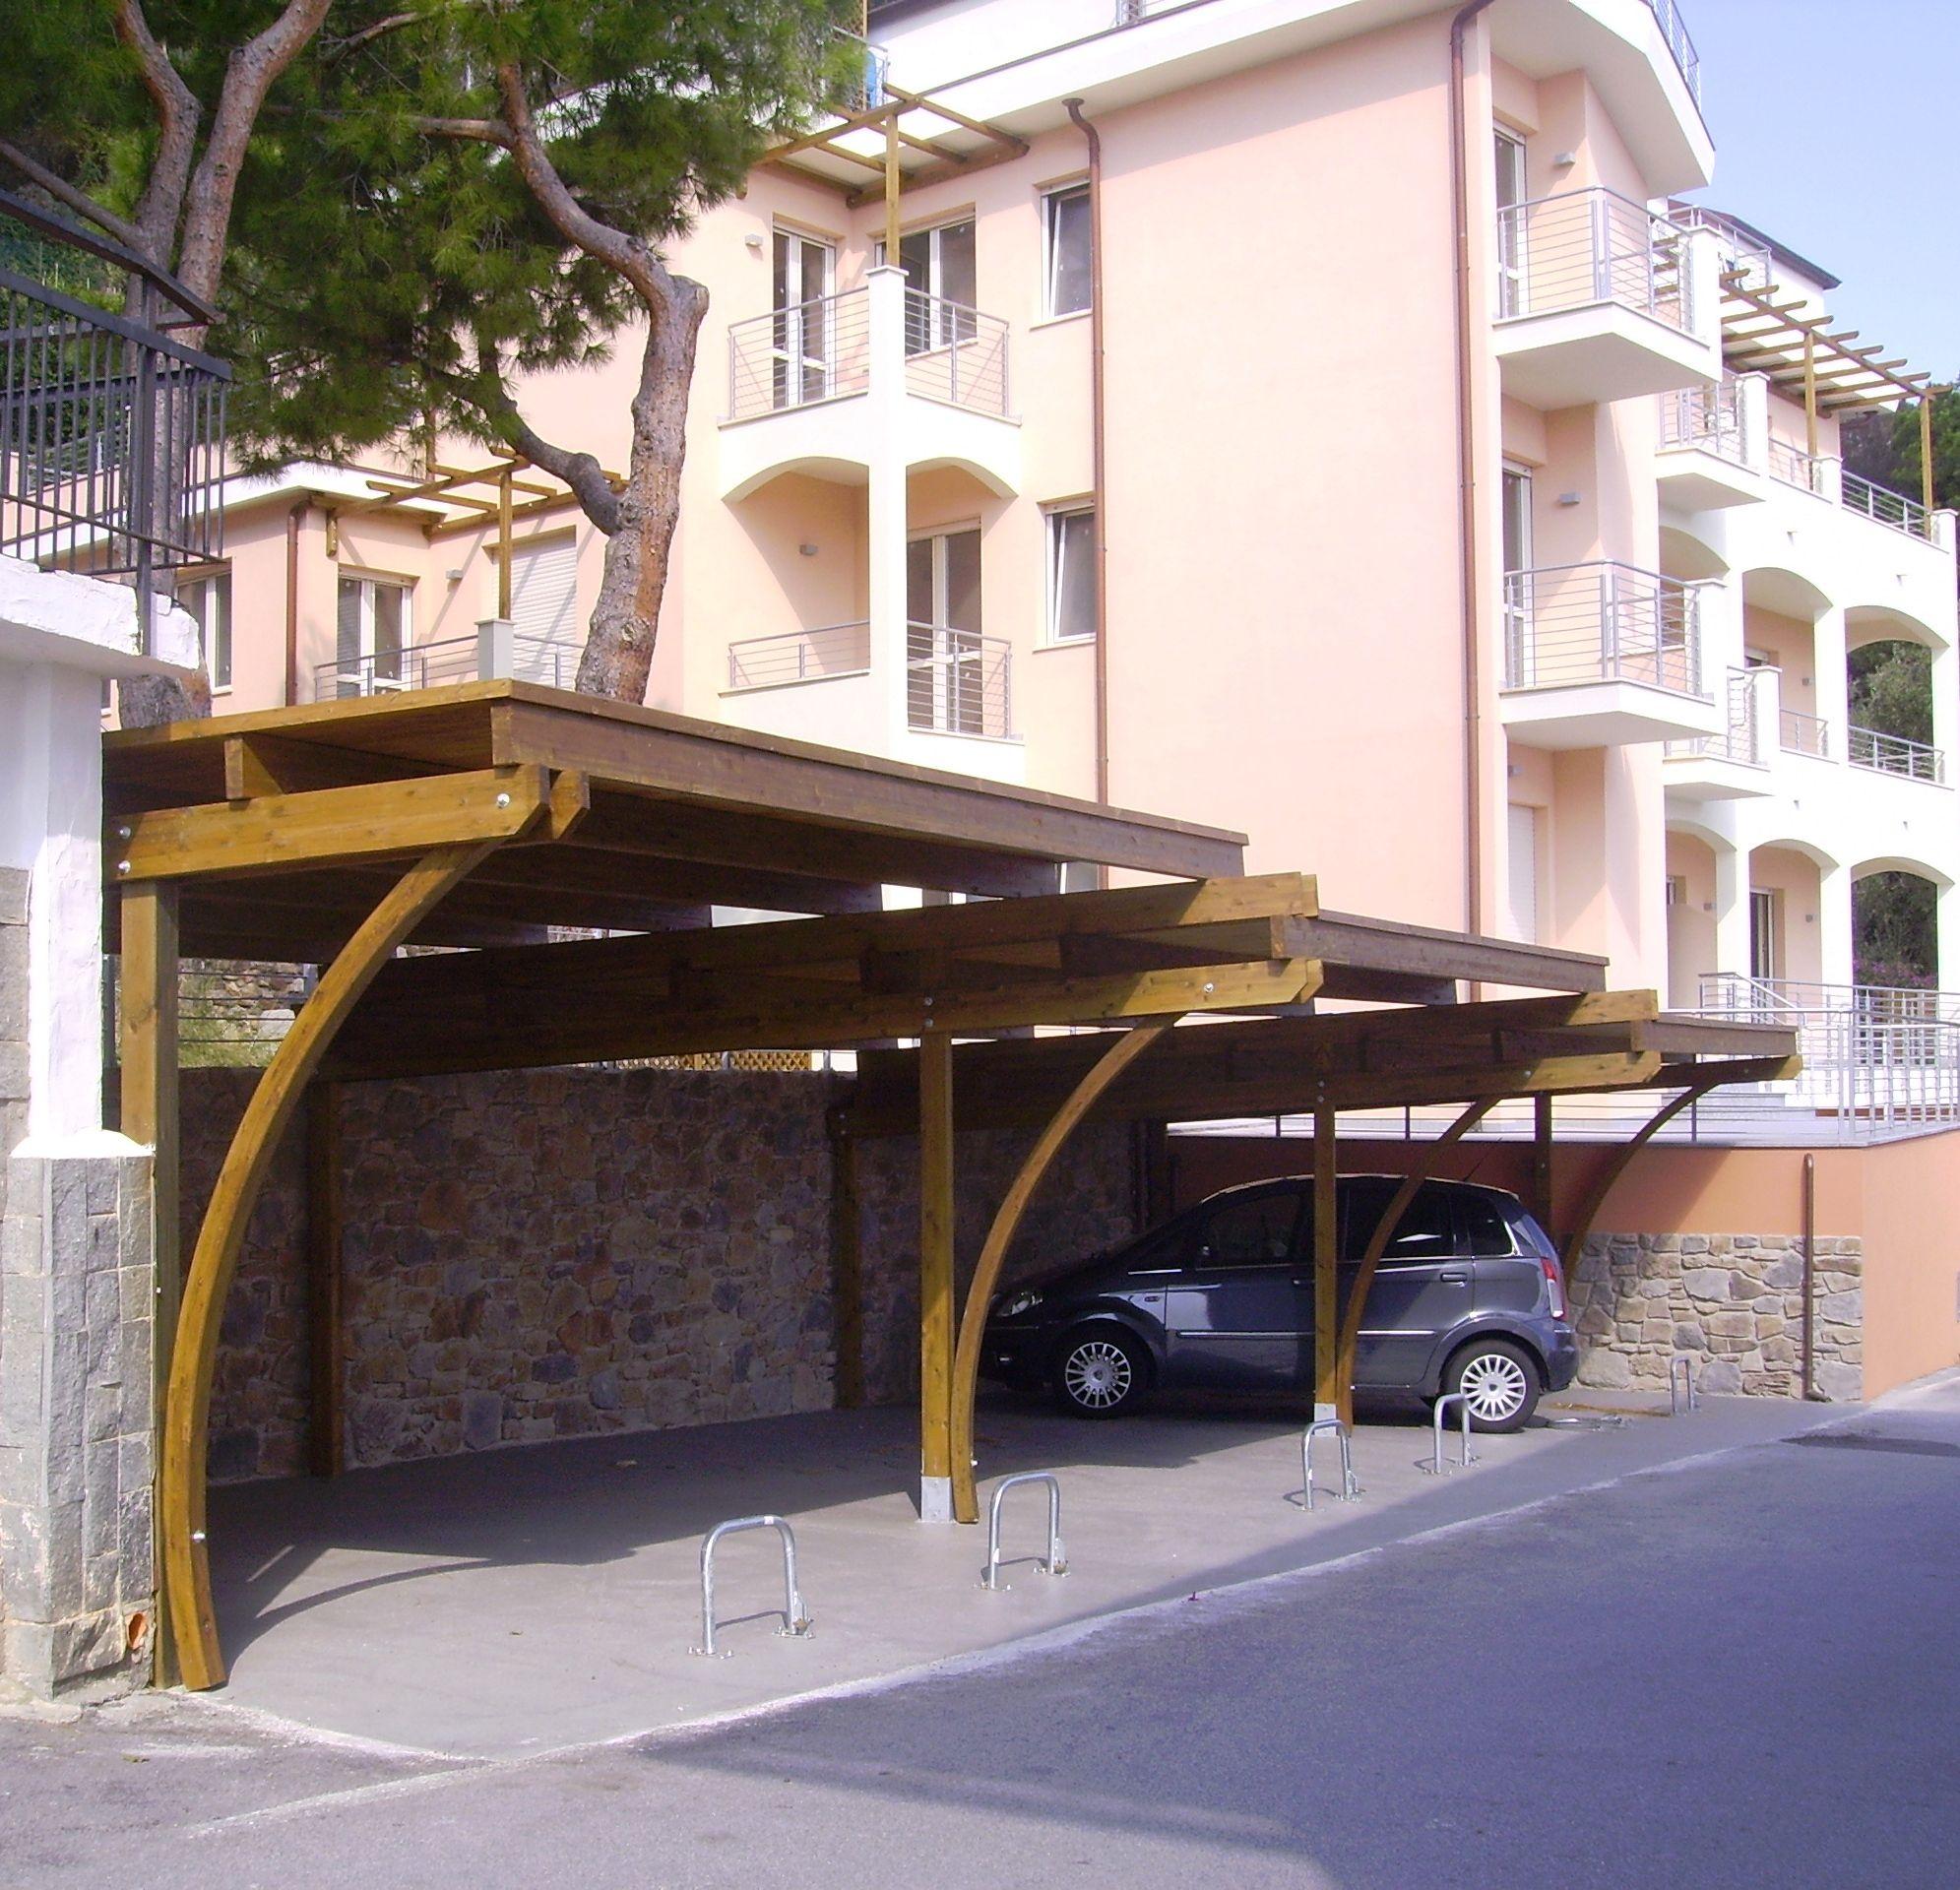 Carport struttura posti auto Posto auto, Struttura, Auto